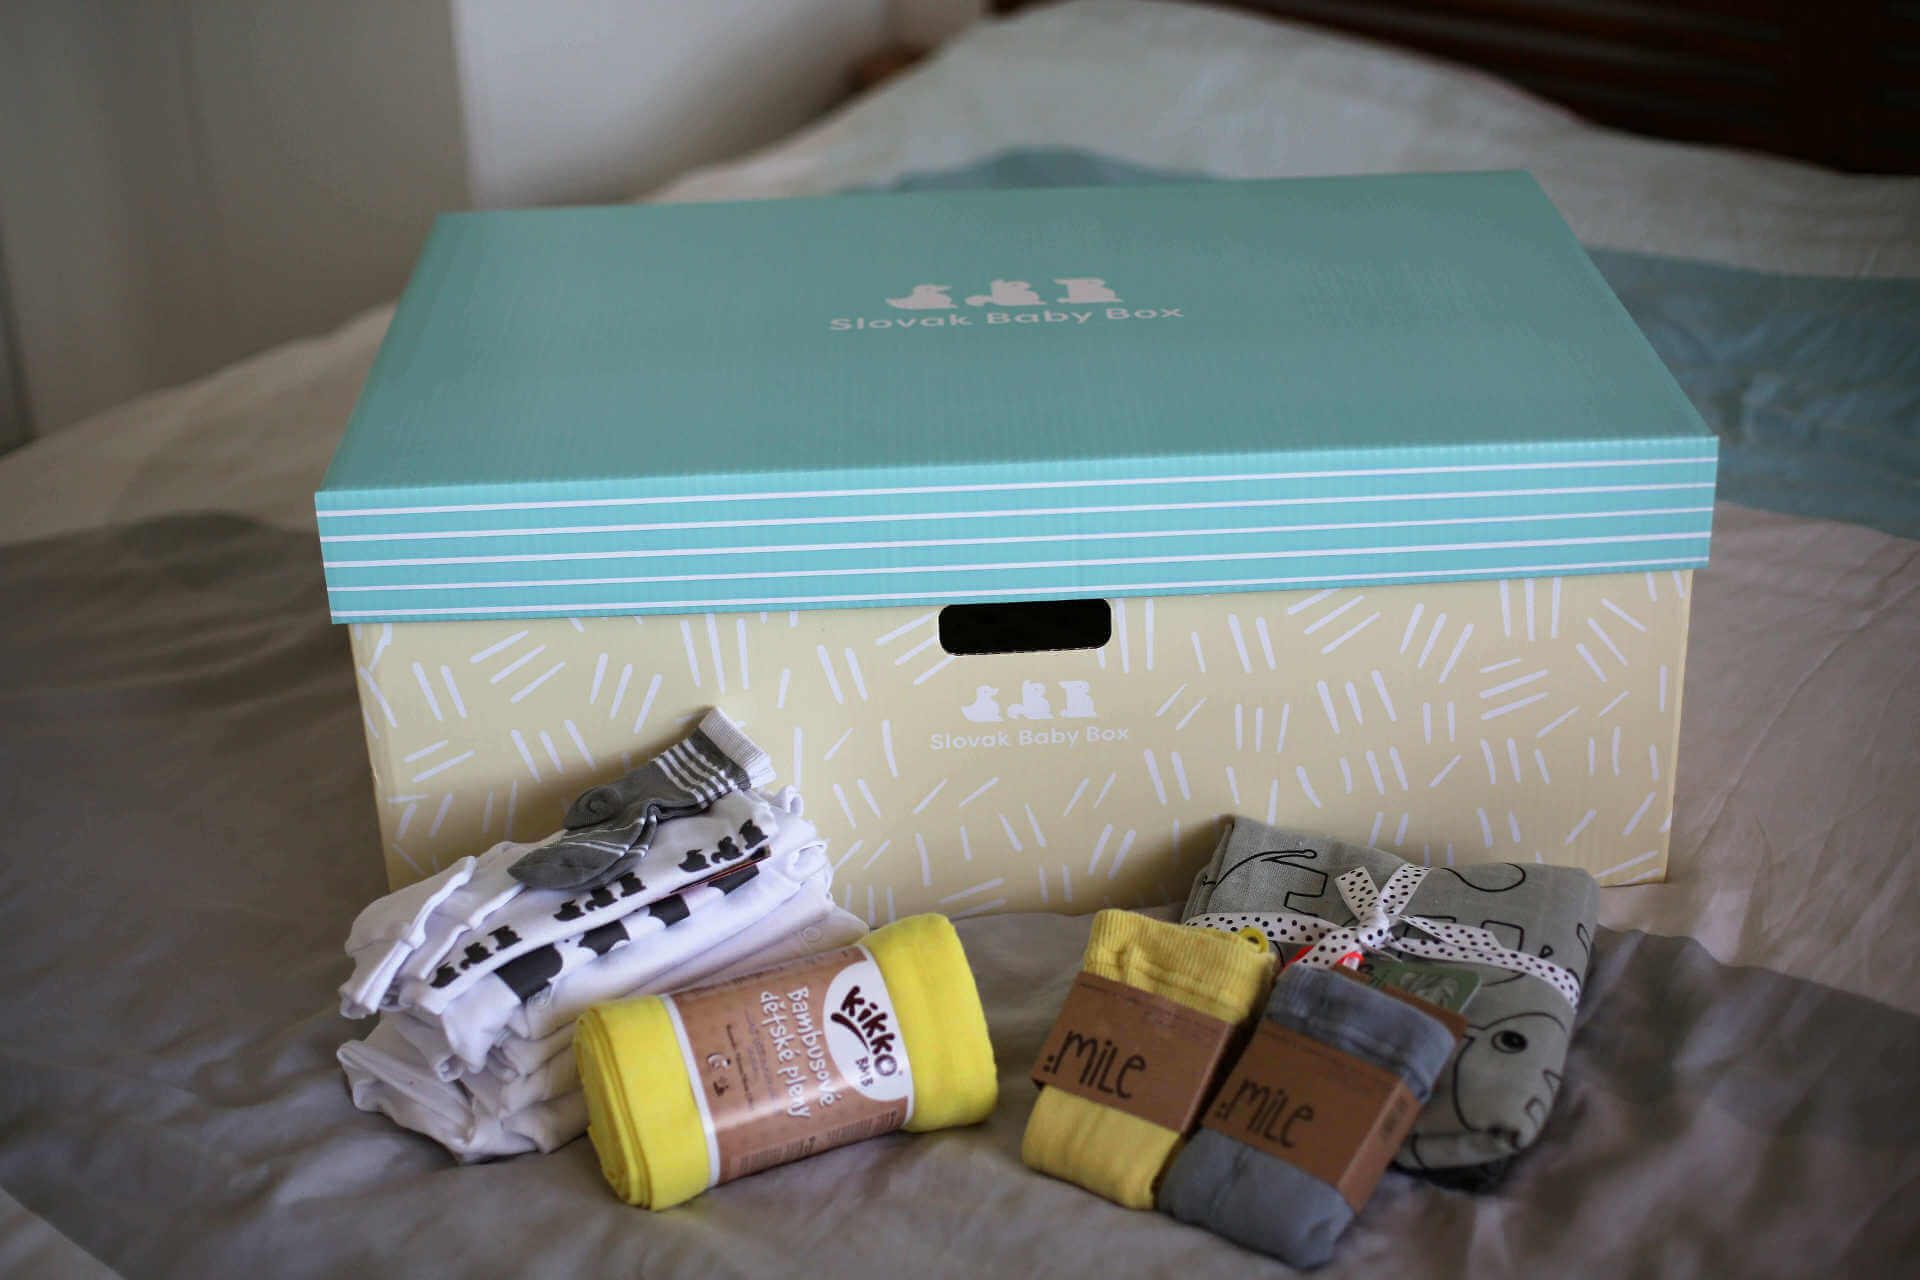 Slovak Baby Box®